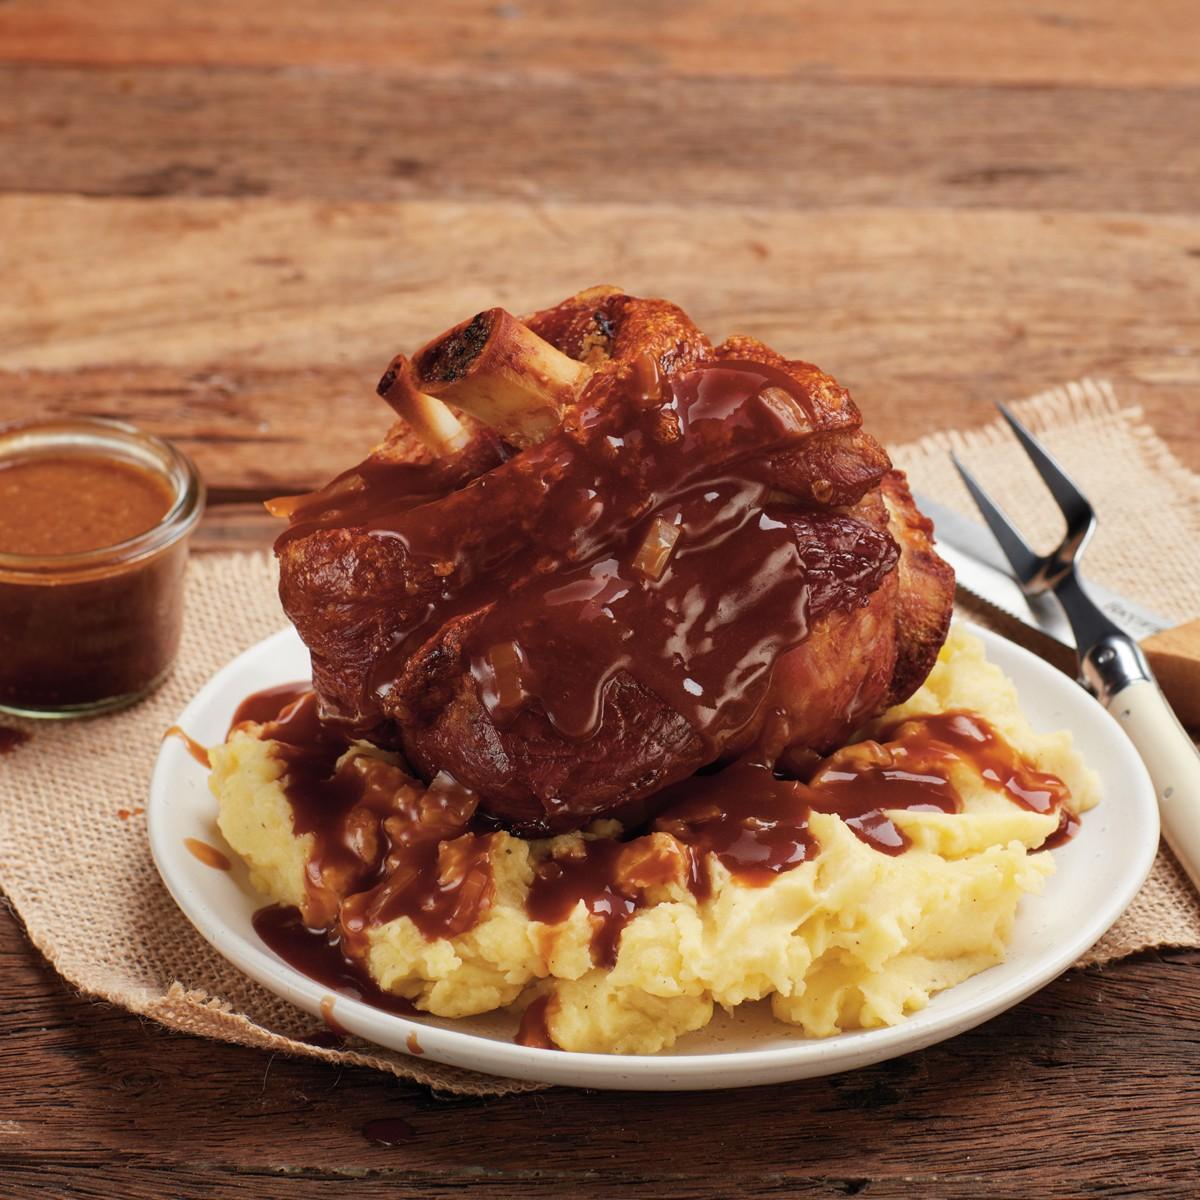 German Pork Knuckle with Bier Gravy - Three Aussie Farmers Slow Cooked German Pork Knuckle